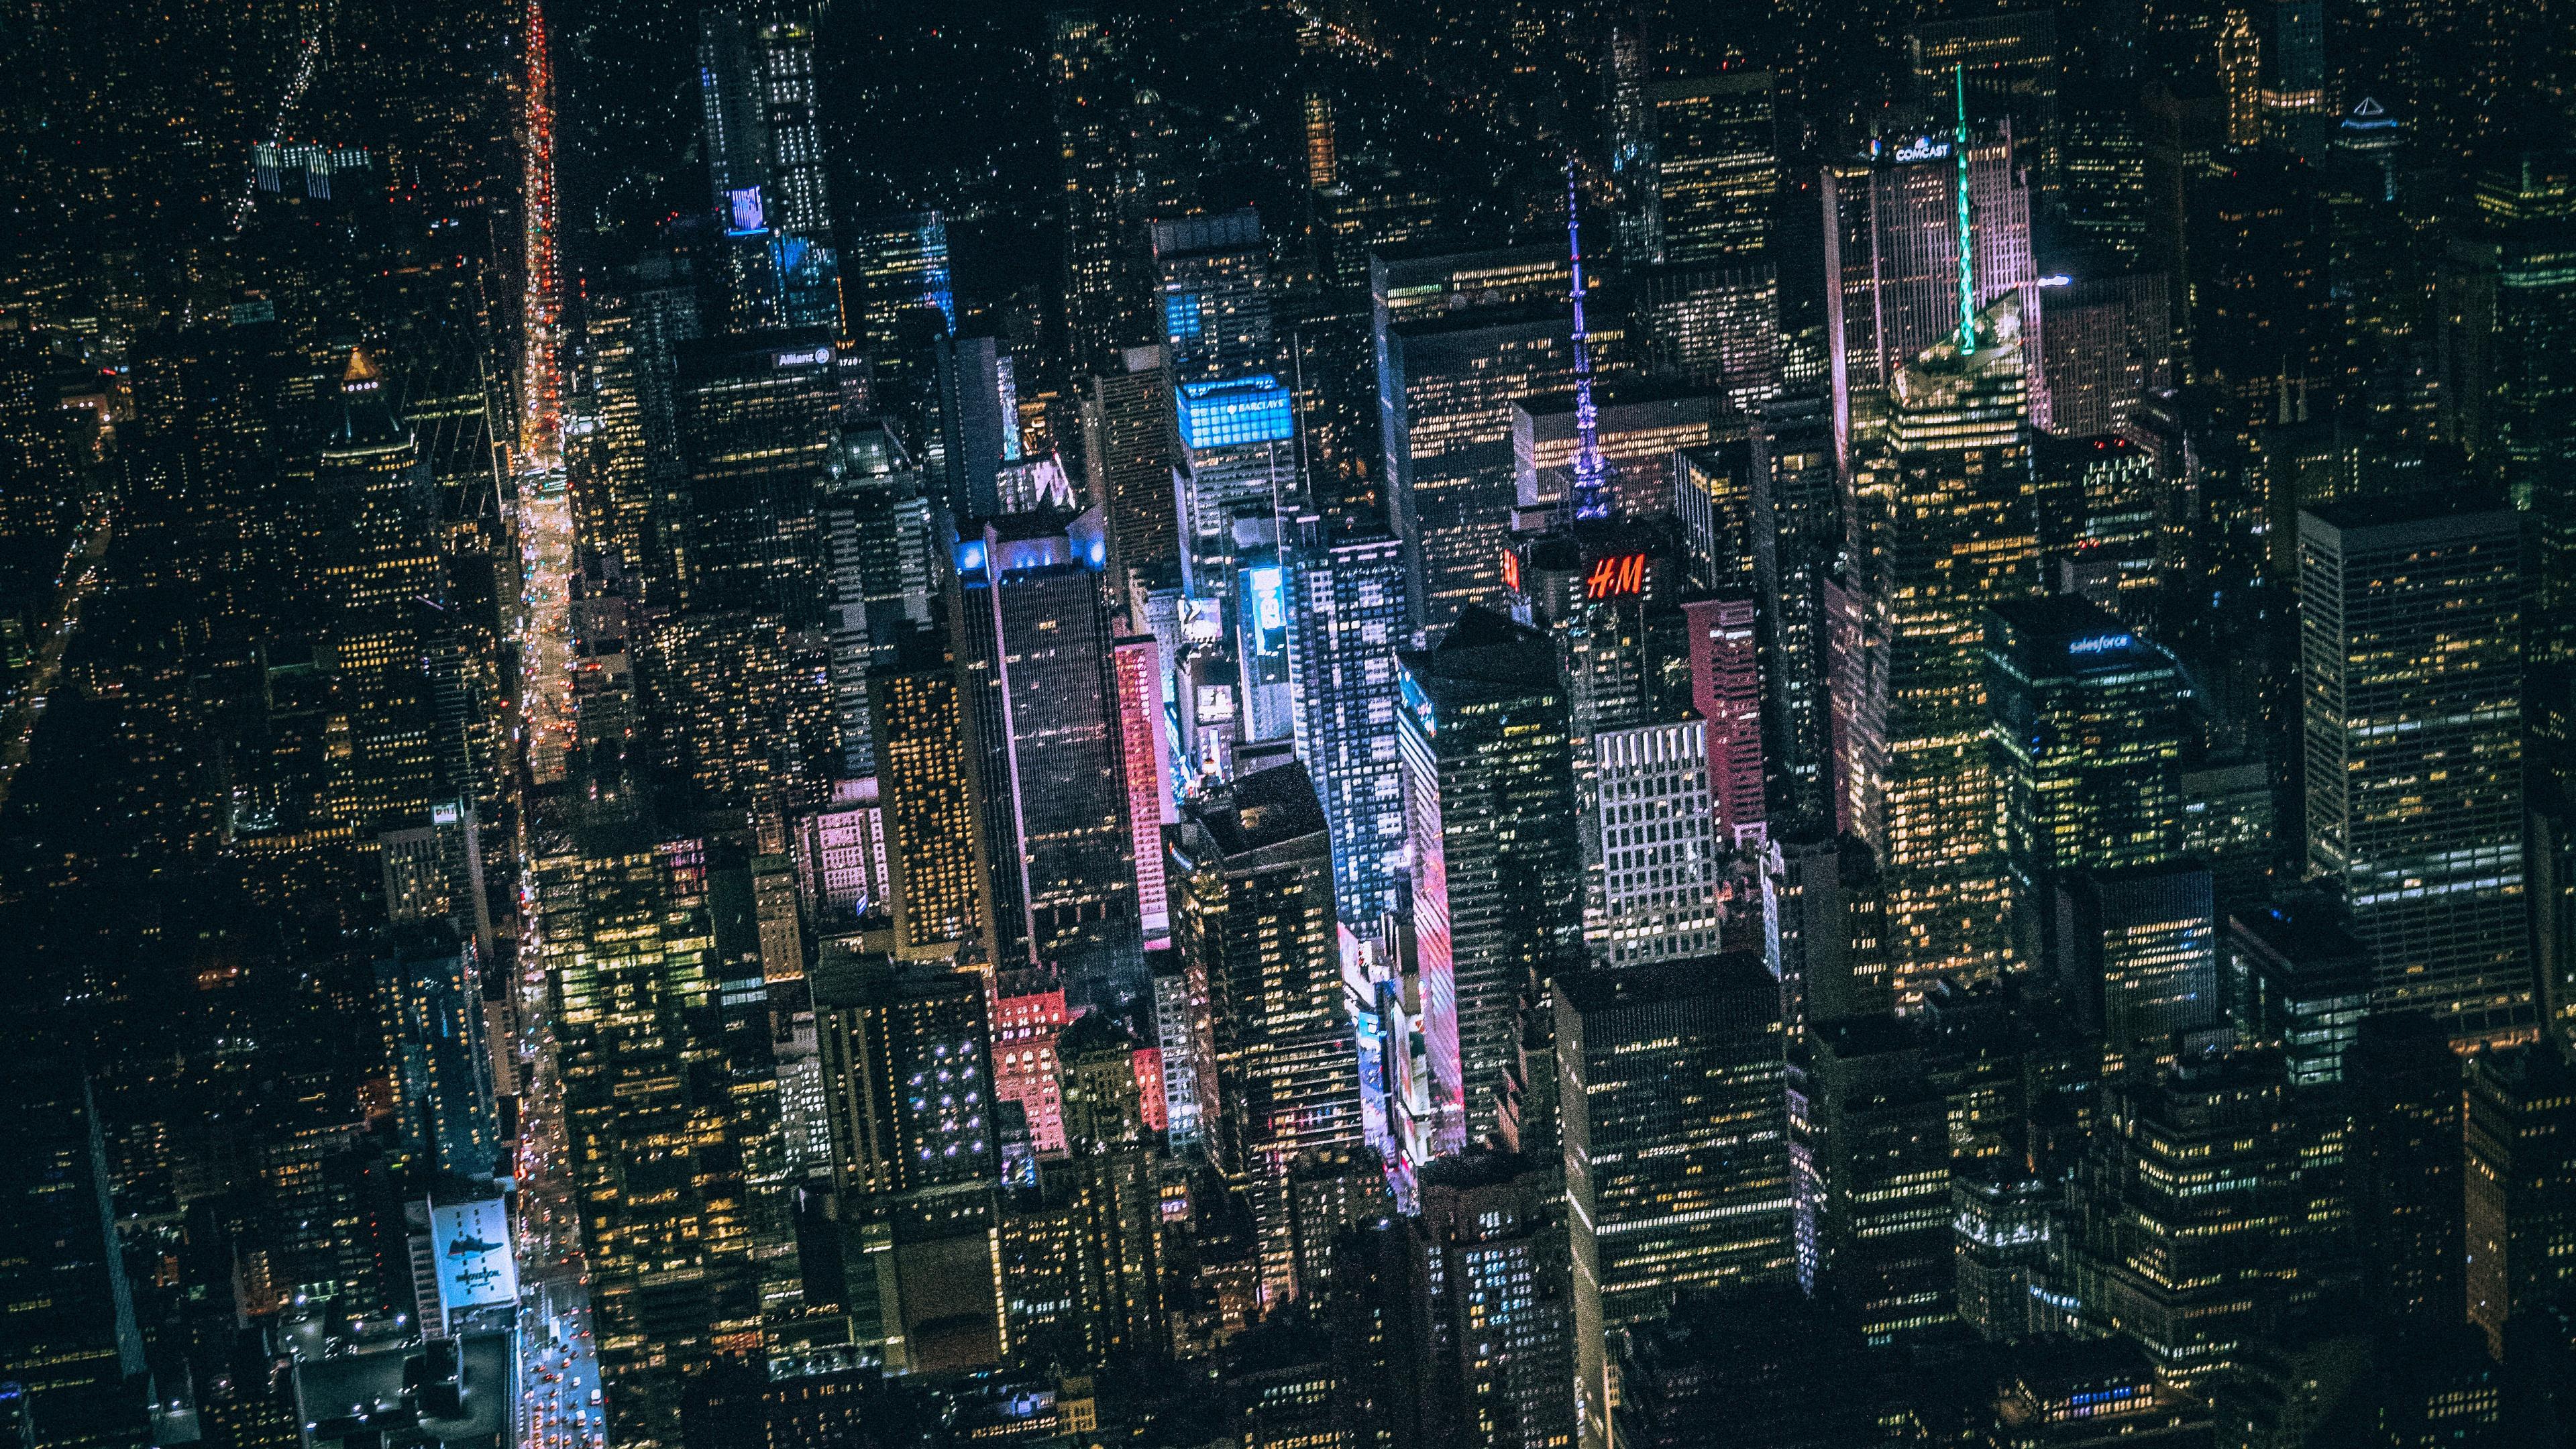 new york dark city night lights buildings view from top 5k 1538070275 - New York Dark City Night Lights Buildings View From Top 5k - world wallpapers, night wallpapers, new york wallpapers, lights wallpapers, hd-wallpapers, city wallpapers, 5k wallpapers, 4k-wallpapers